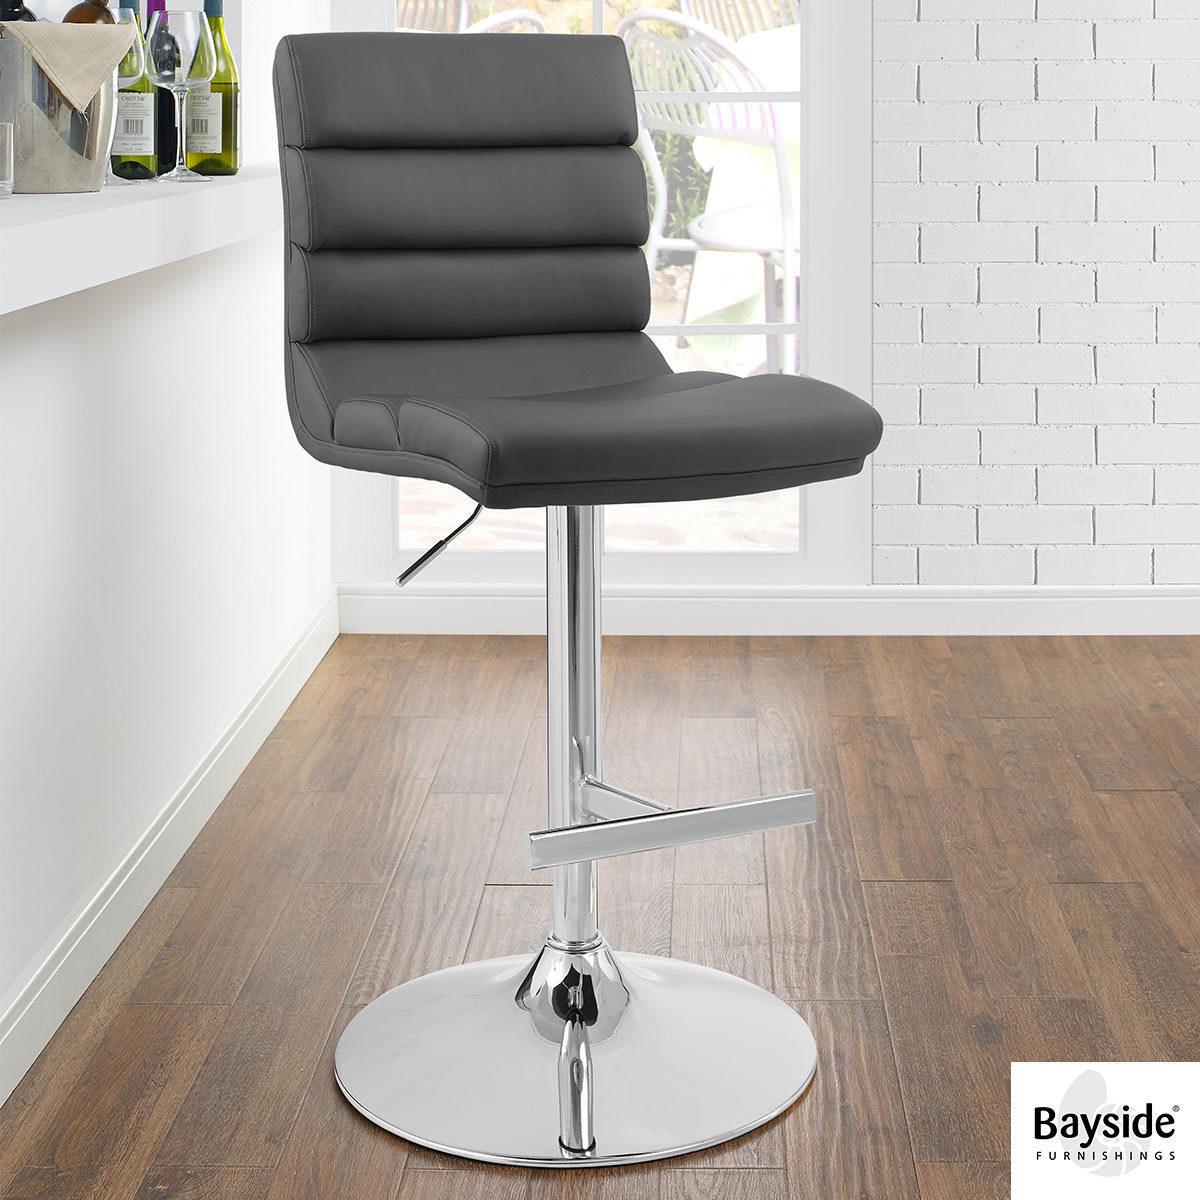 Bayside Furnishings Grey Bonded Leather Gas Lift Bar Stool Costco Uk